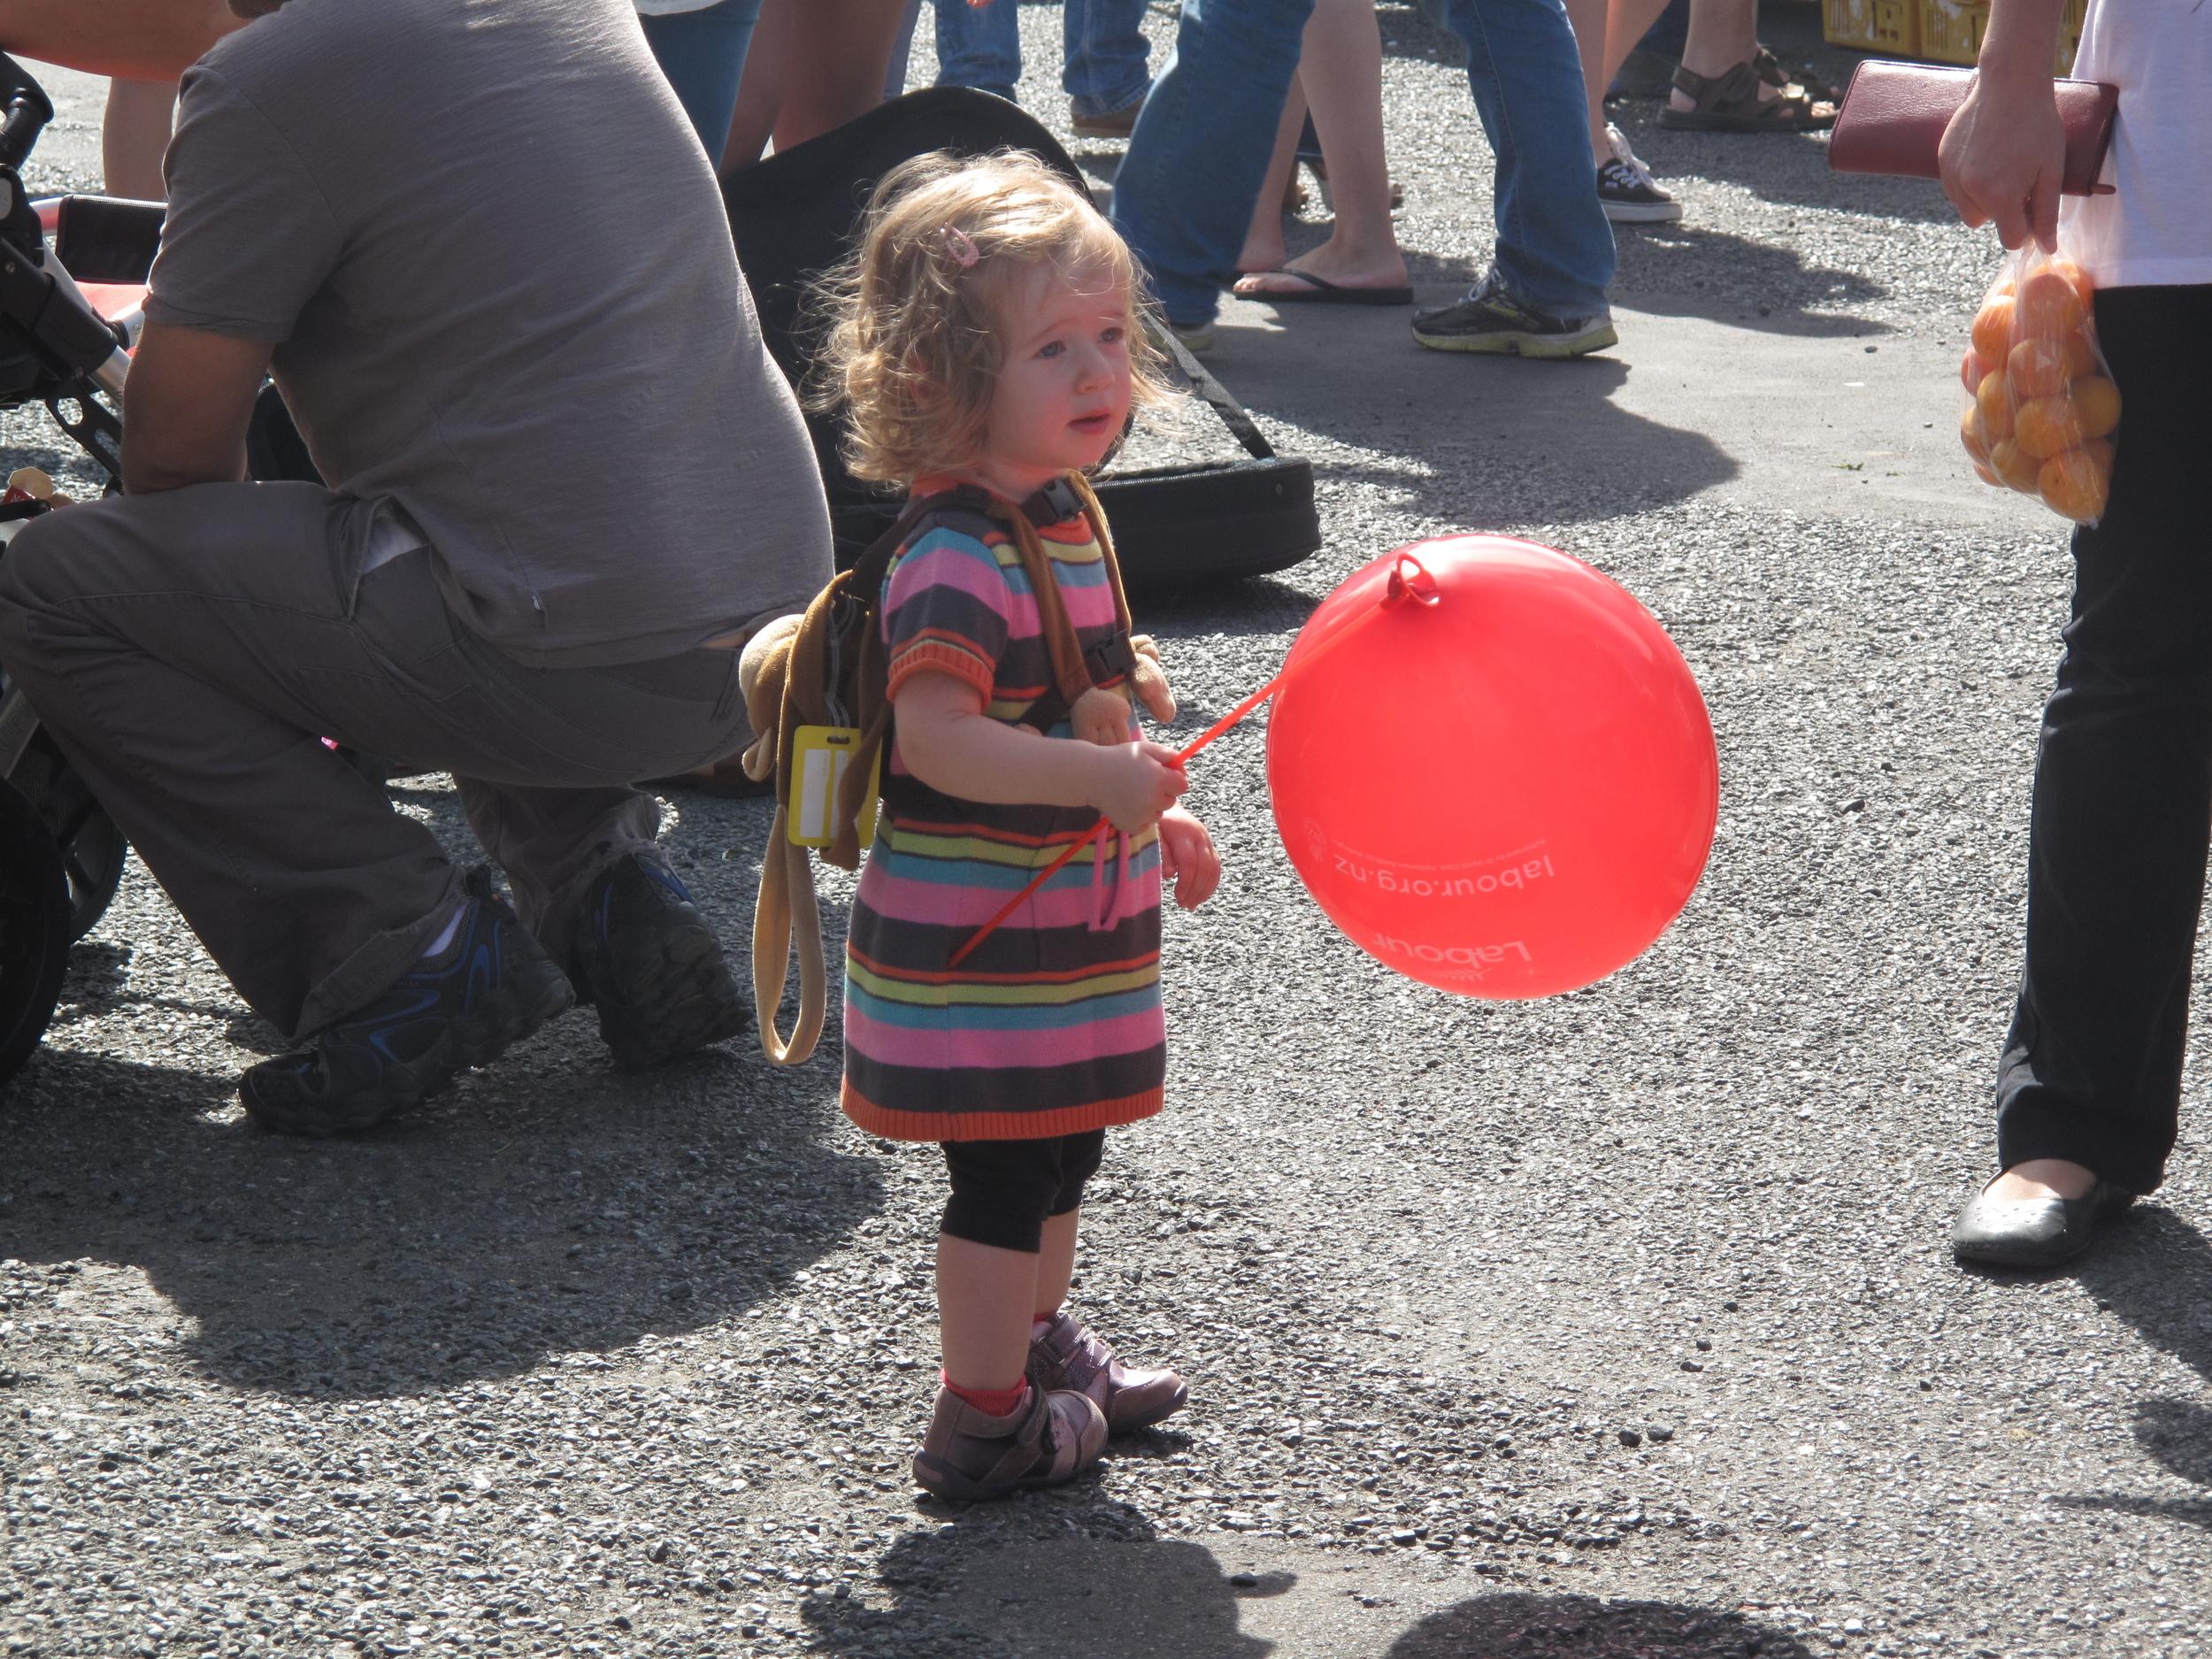 girl with a balloon at the Dunedin Farmer's Market